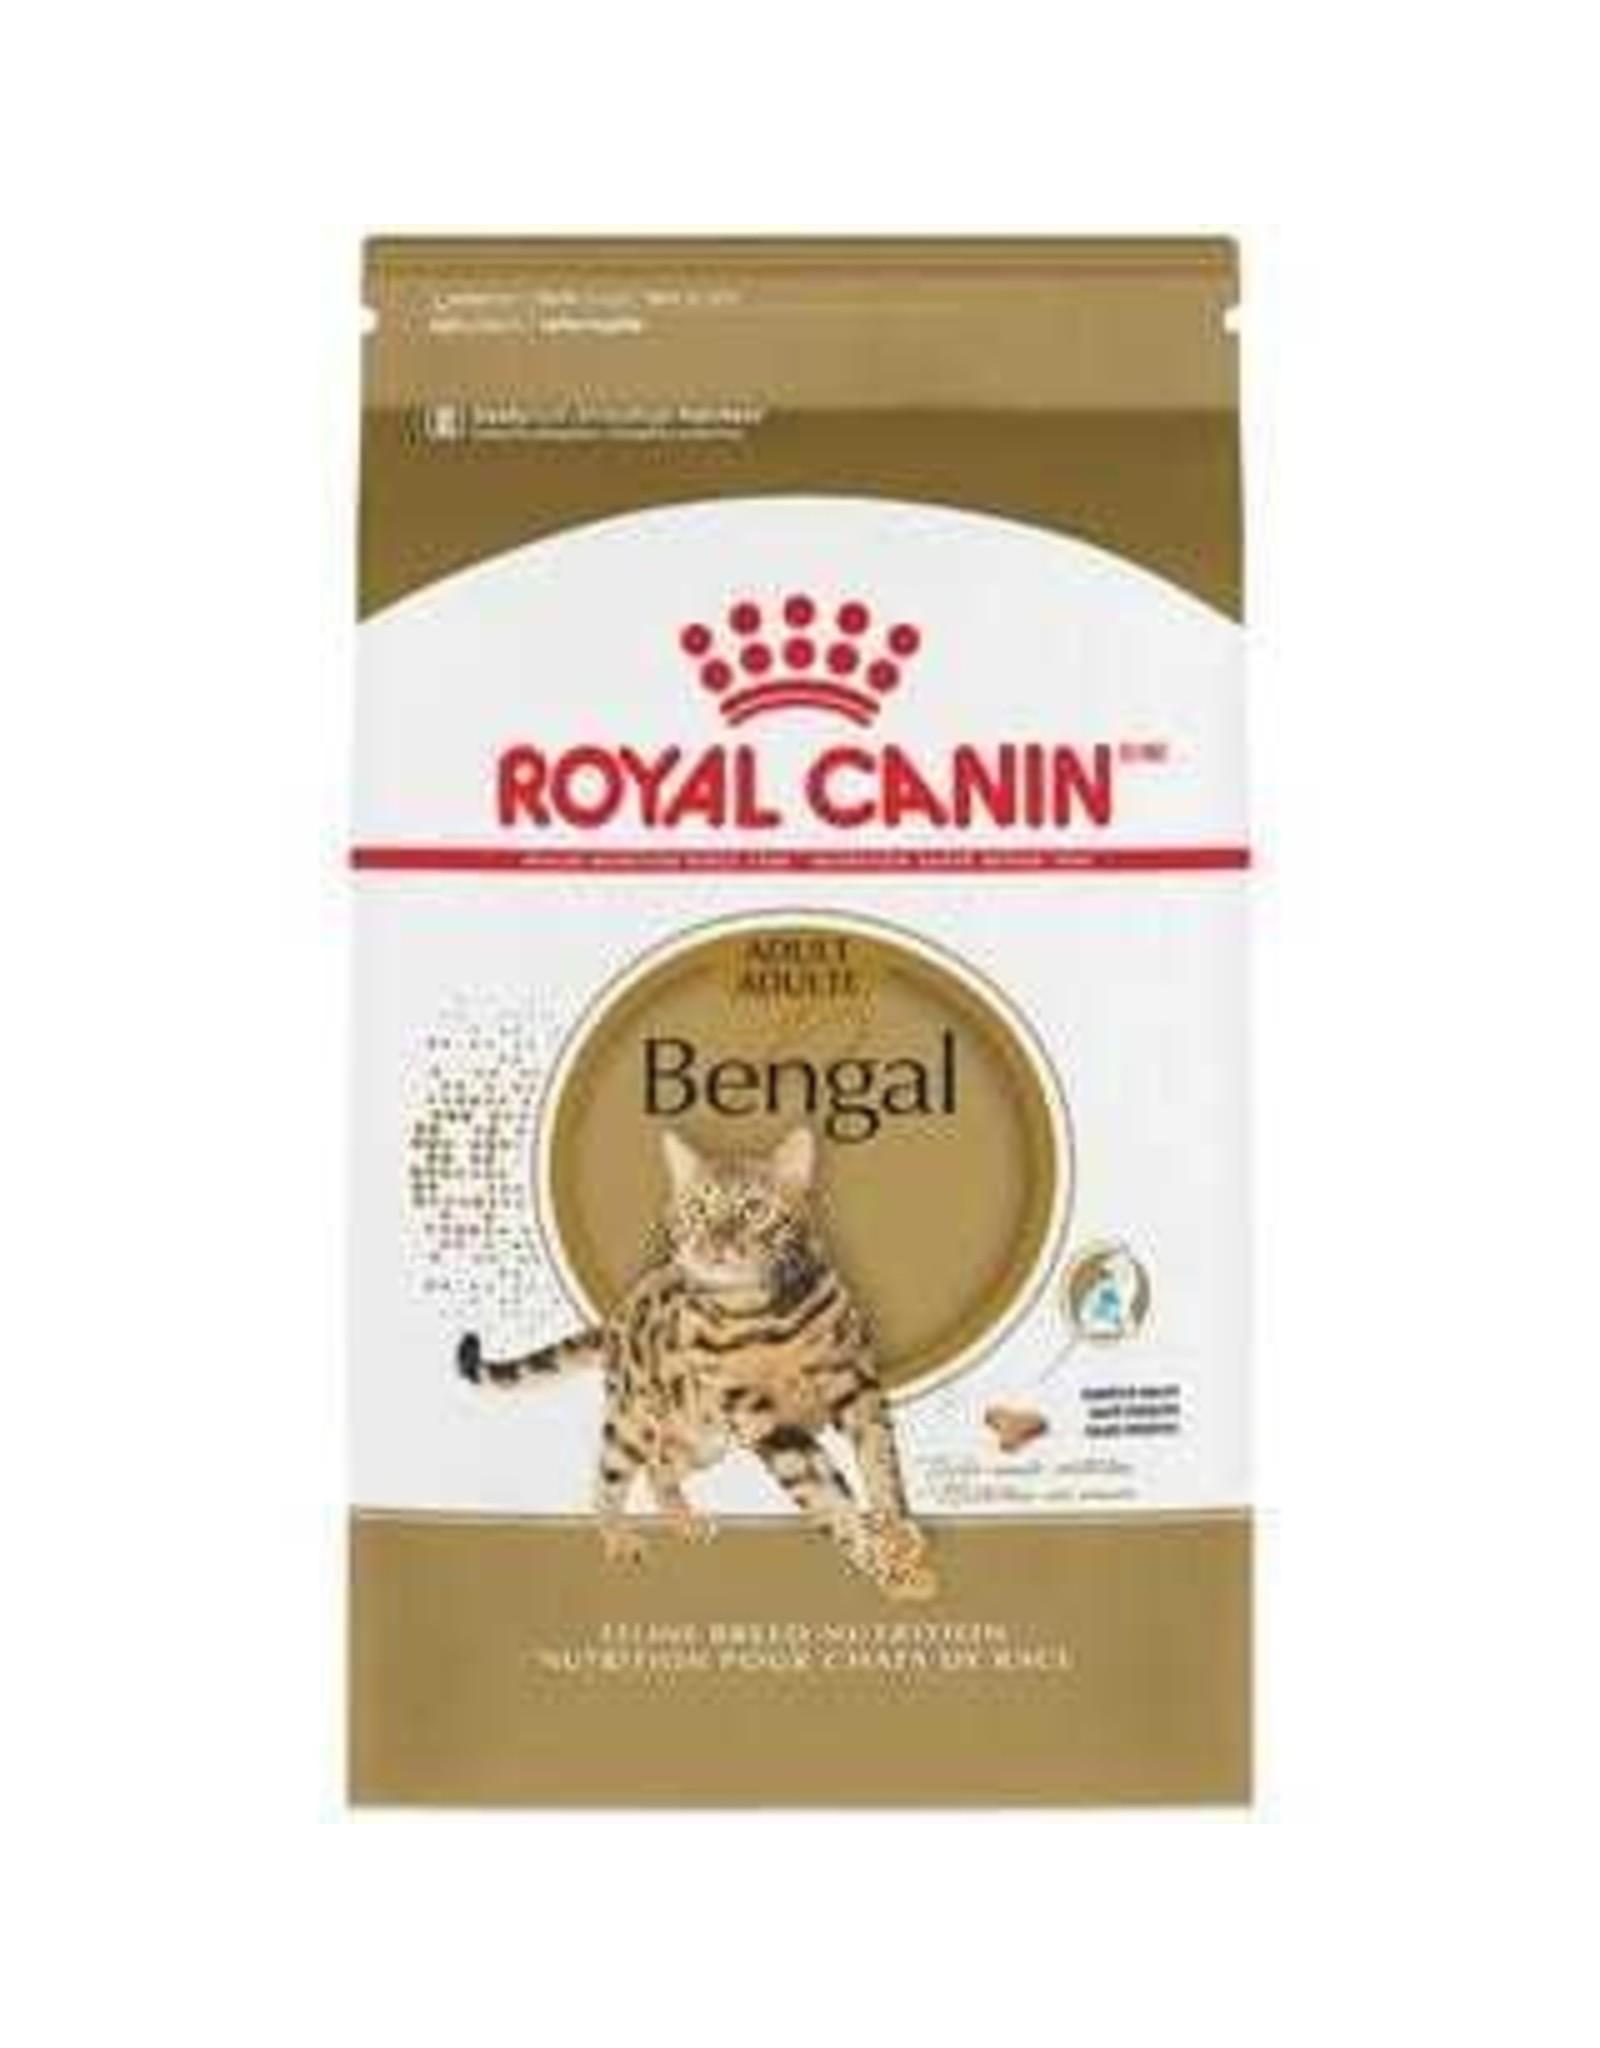 Royal Canin Royal Canin Cat - Breed Bengal 7lb